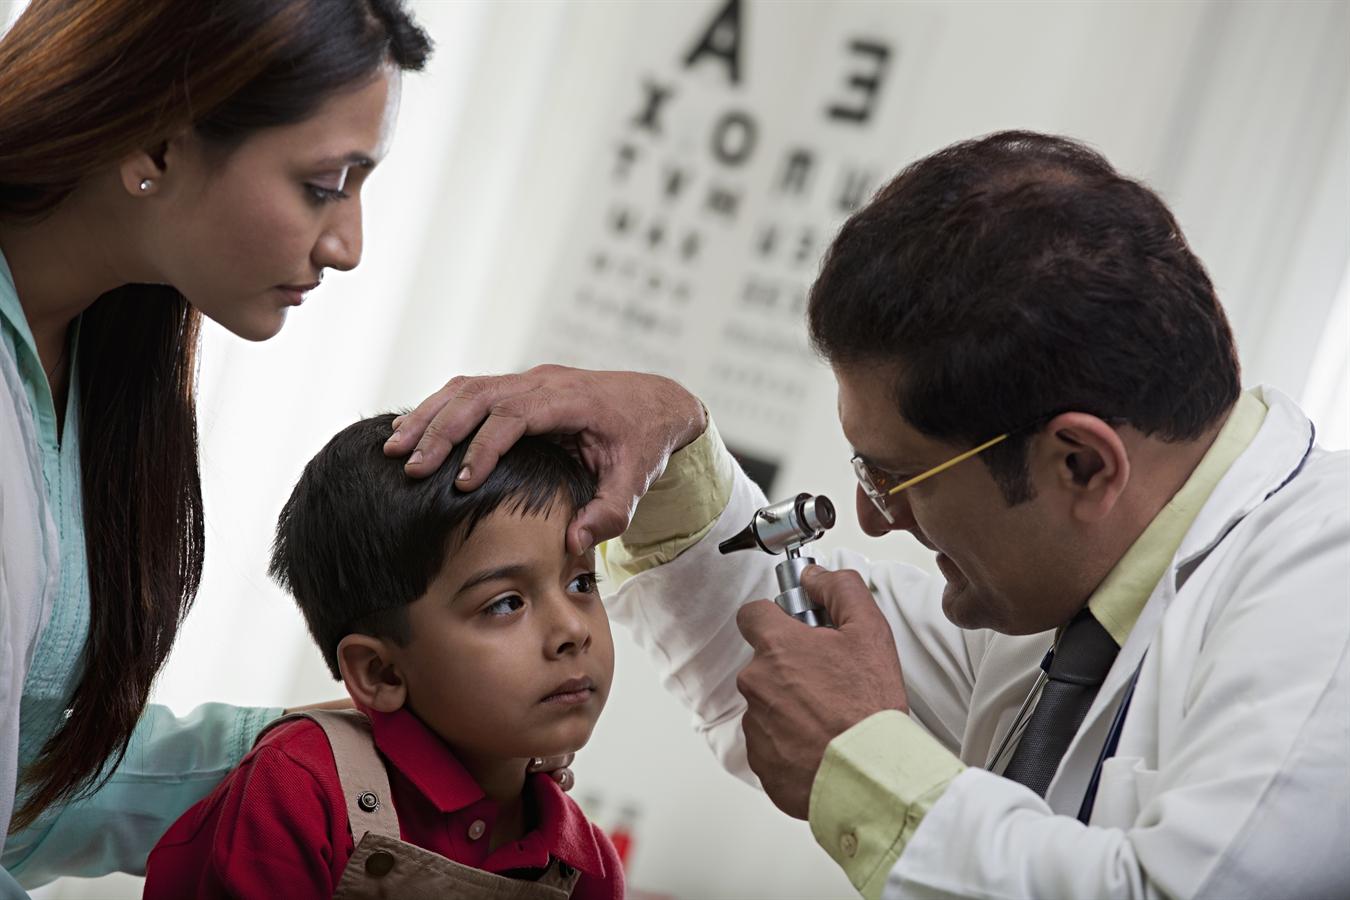 A child gets an eye exam